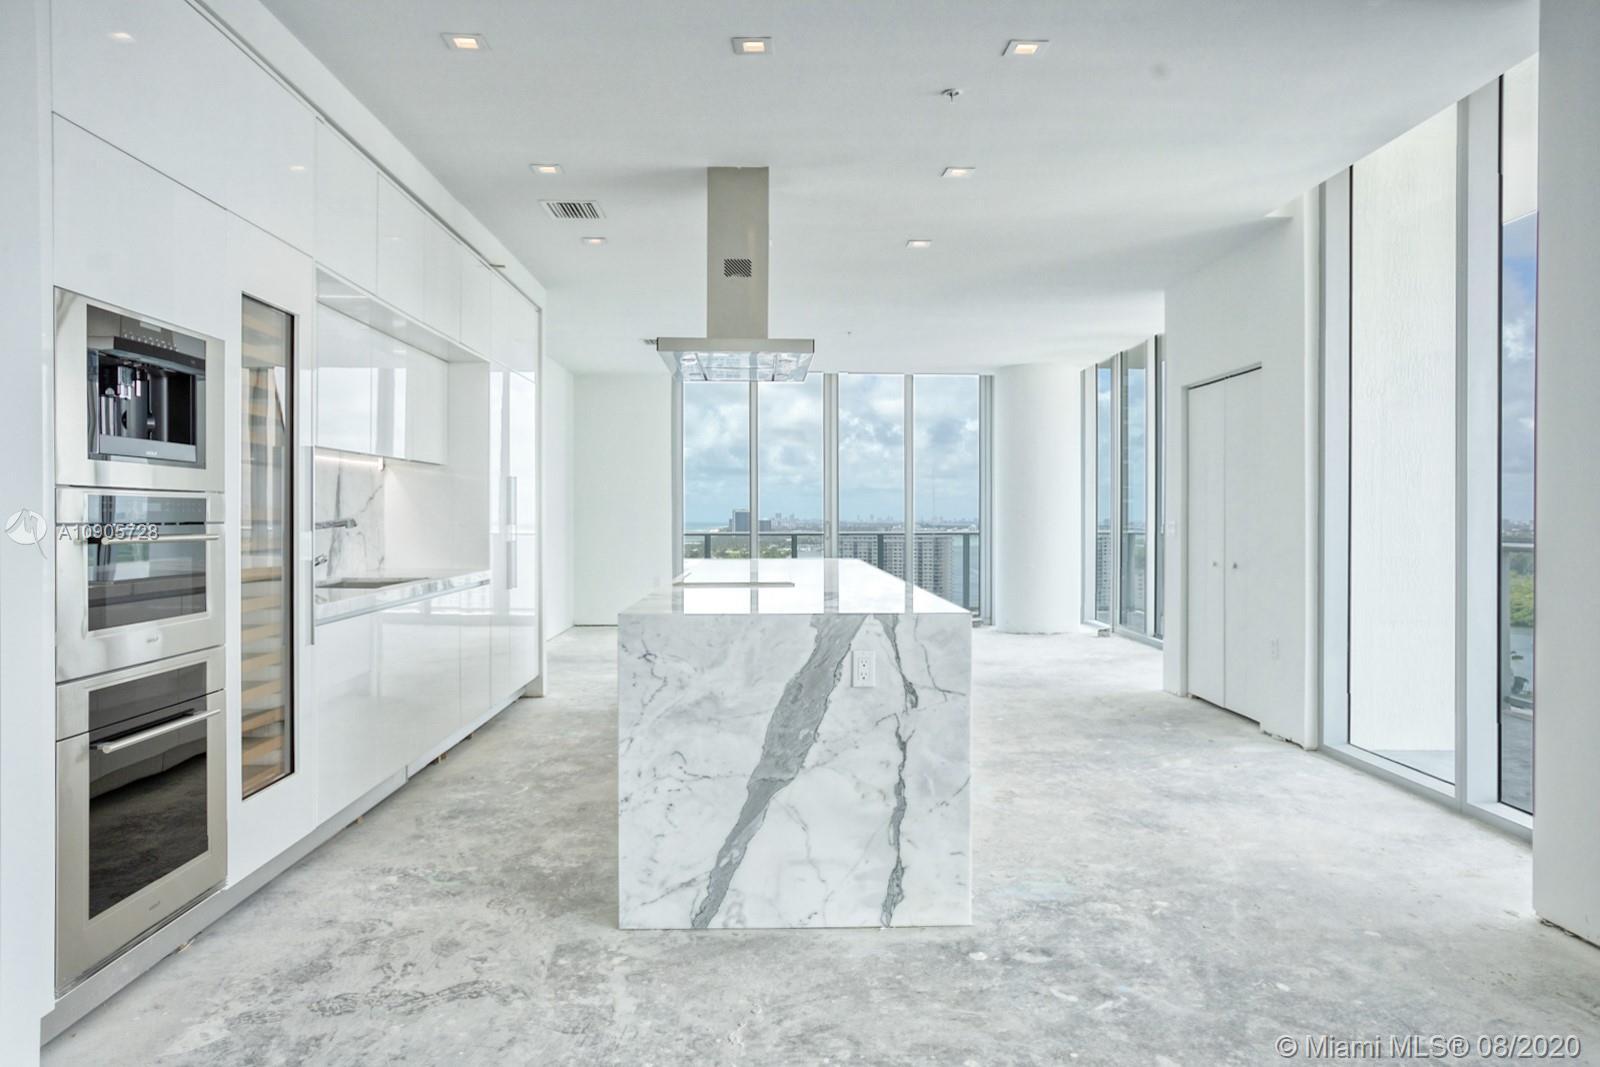 Real Estate Photo A10905728